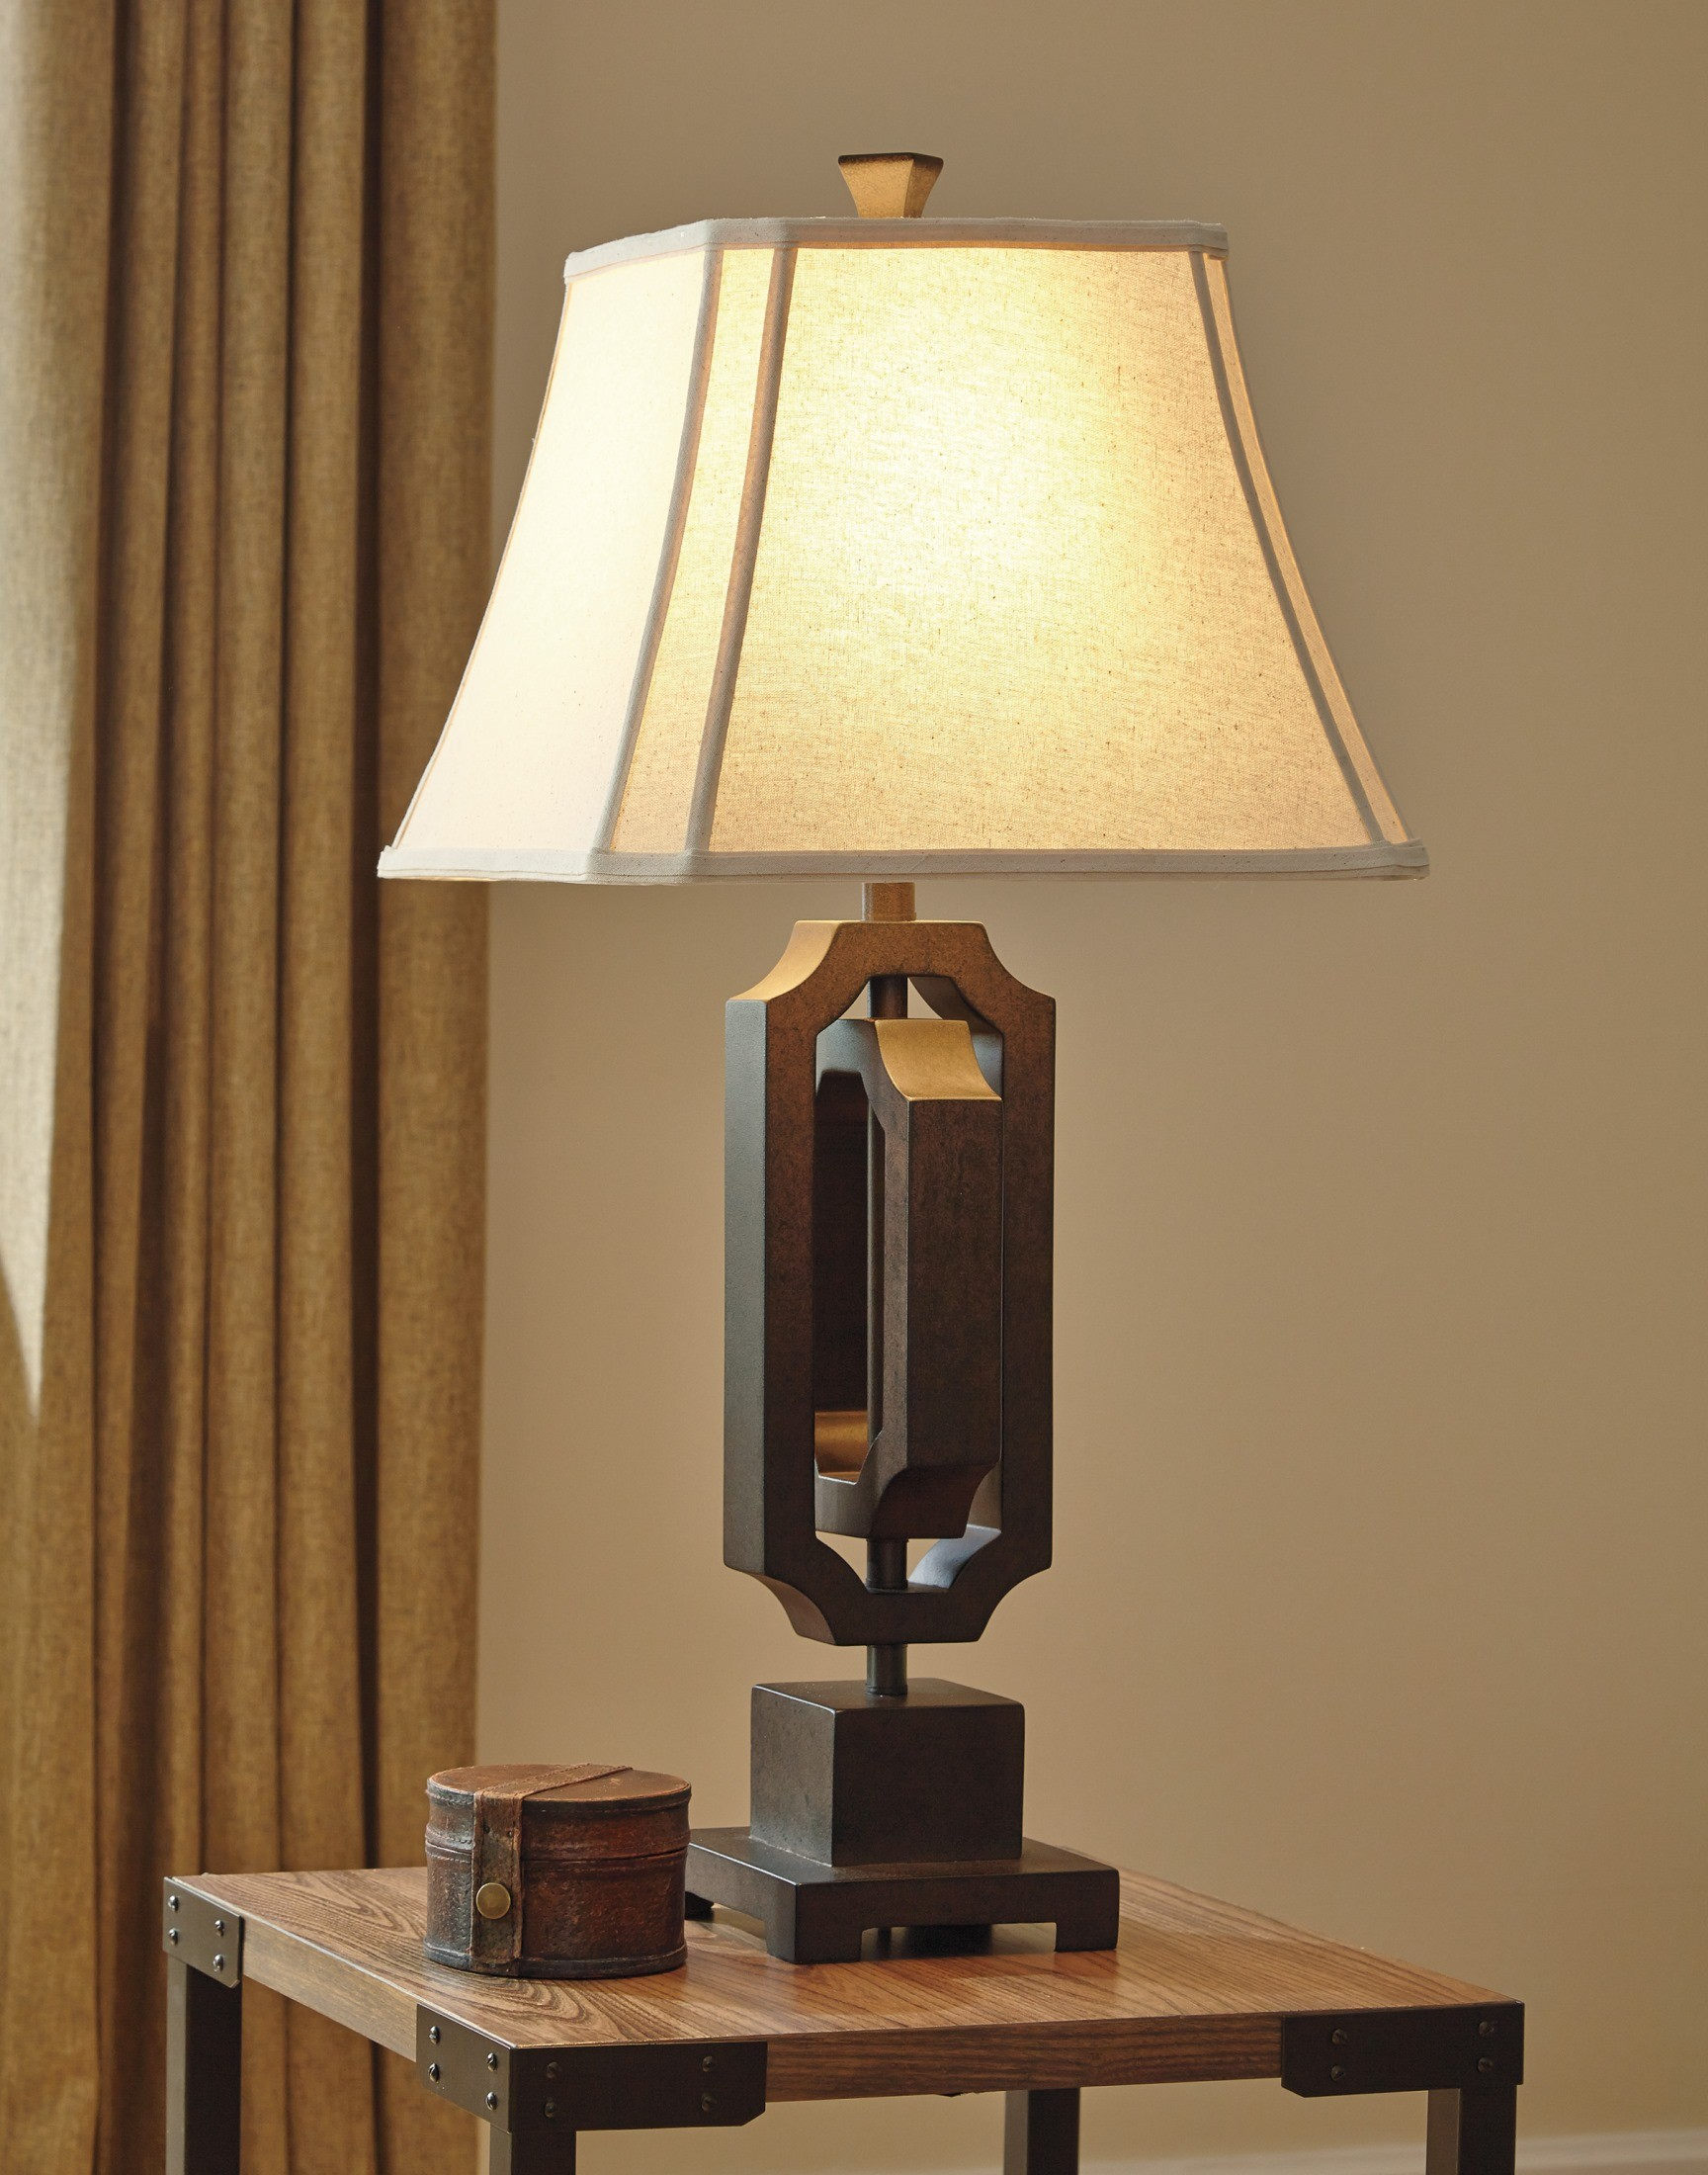 l235454 poly table lamp l235454 ashley. Black Bedroom Furniture Sets. Home Design Ideas